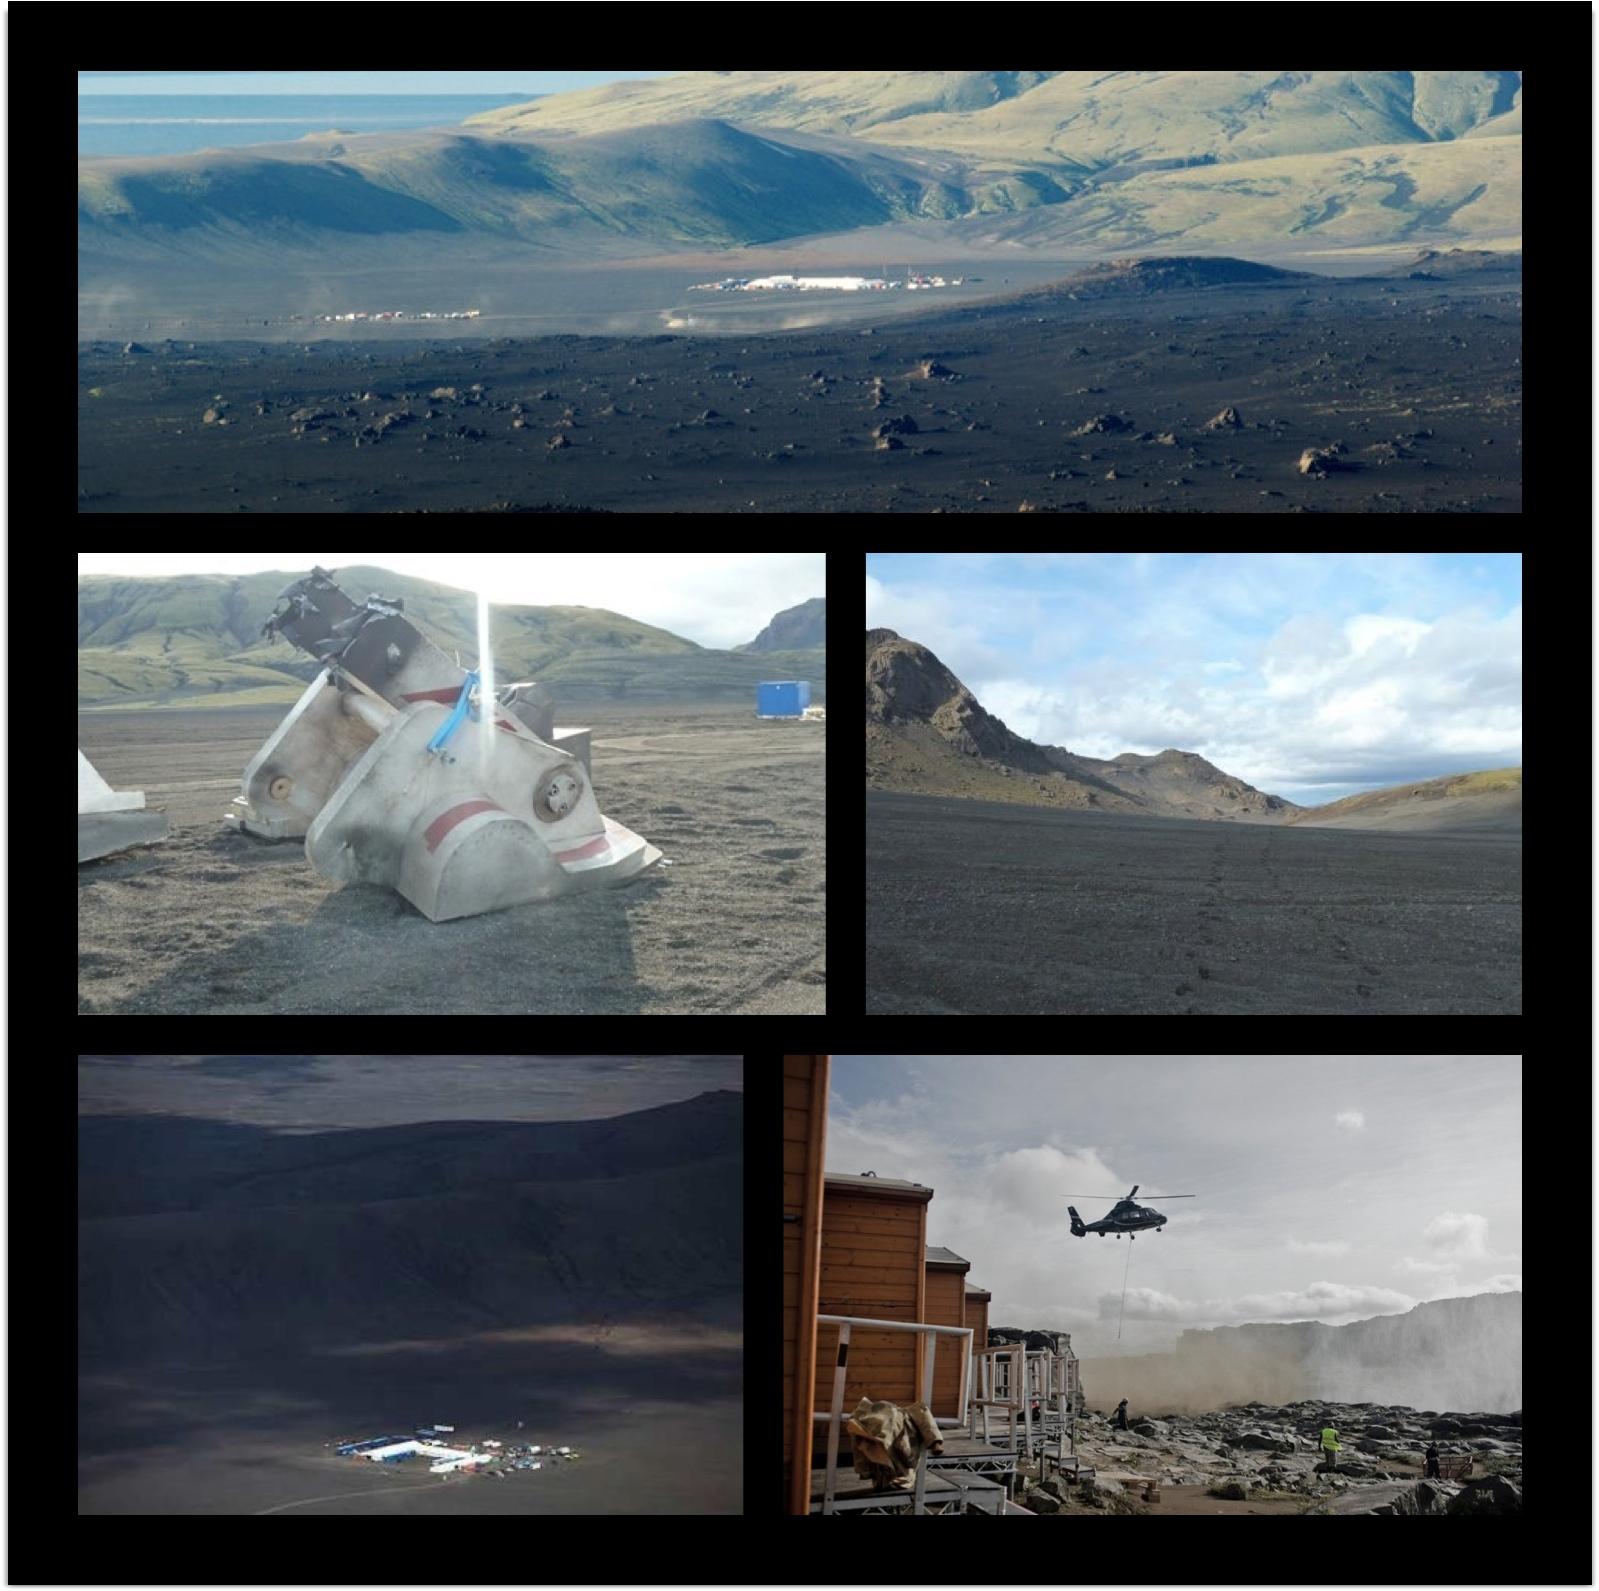 http://4.bp.blogspot.com/-9nYNRCKlcOI/TpbCLCML2mI/AAAAAAAAAbs/LKcxKof10CU/s1600/Prometheus+Sets+Locations.jpg